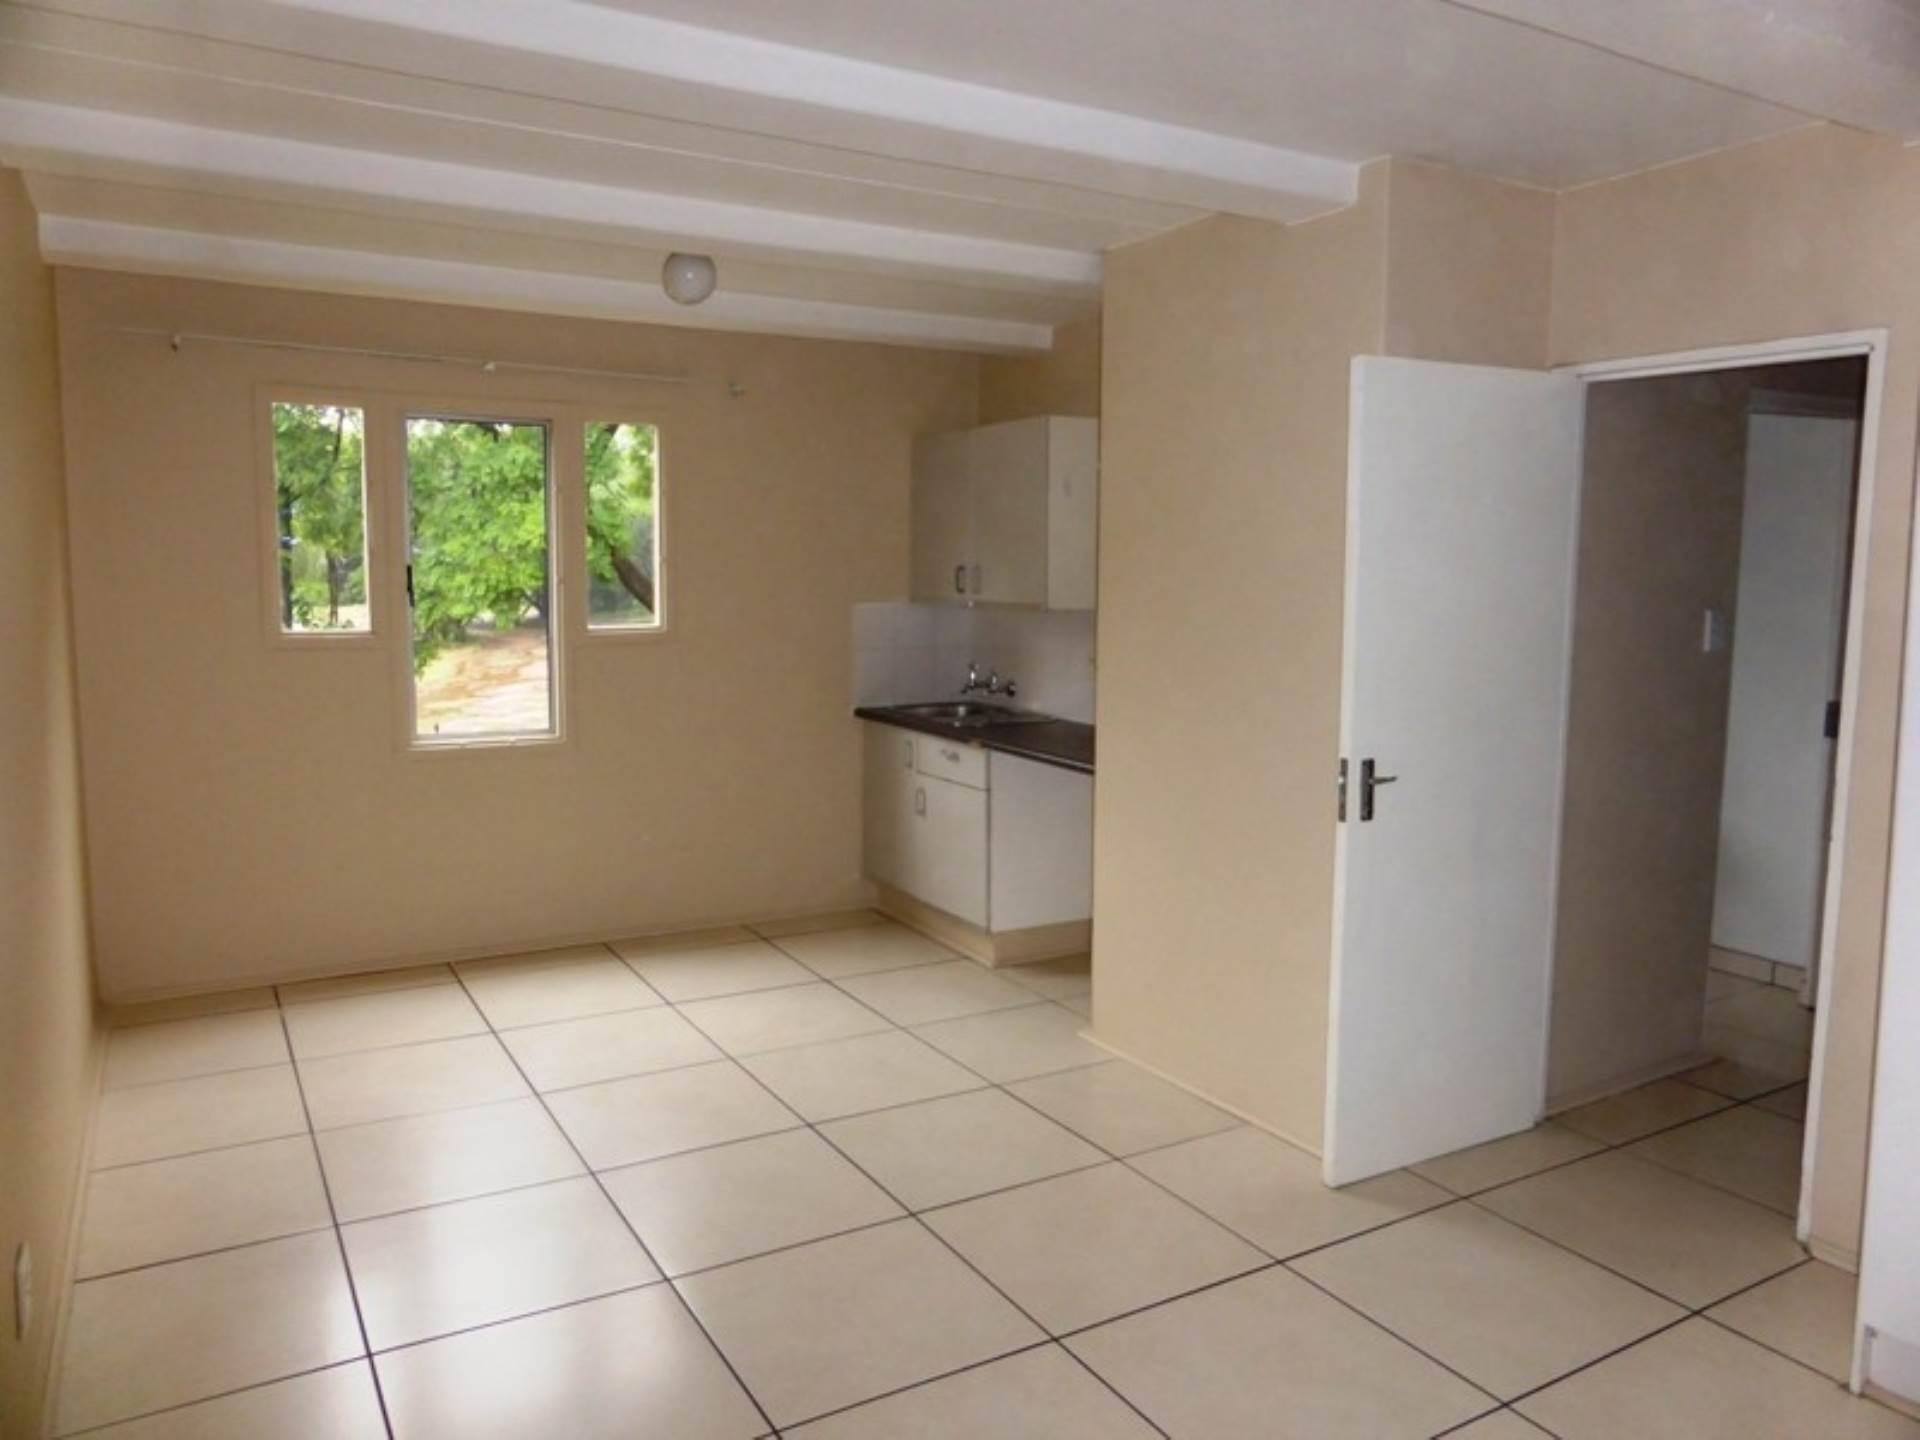 Hatfield property for sale. Ref No: 13536637. Picture no 7